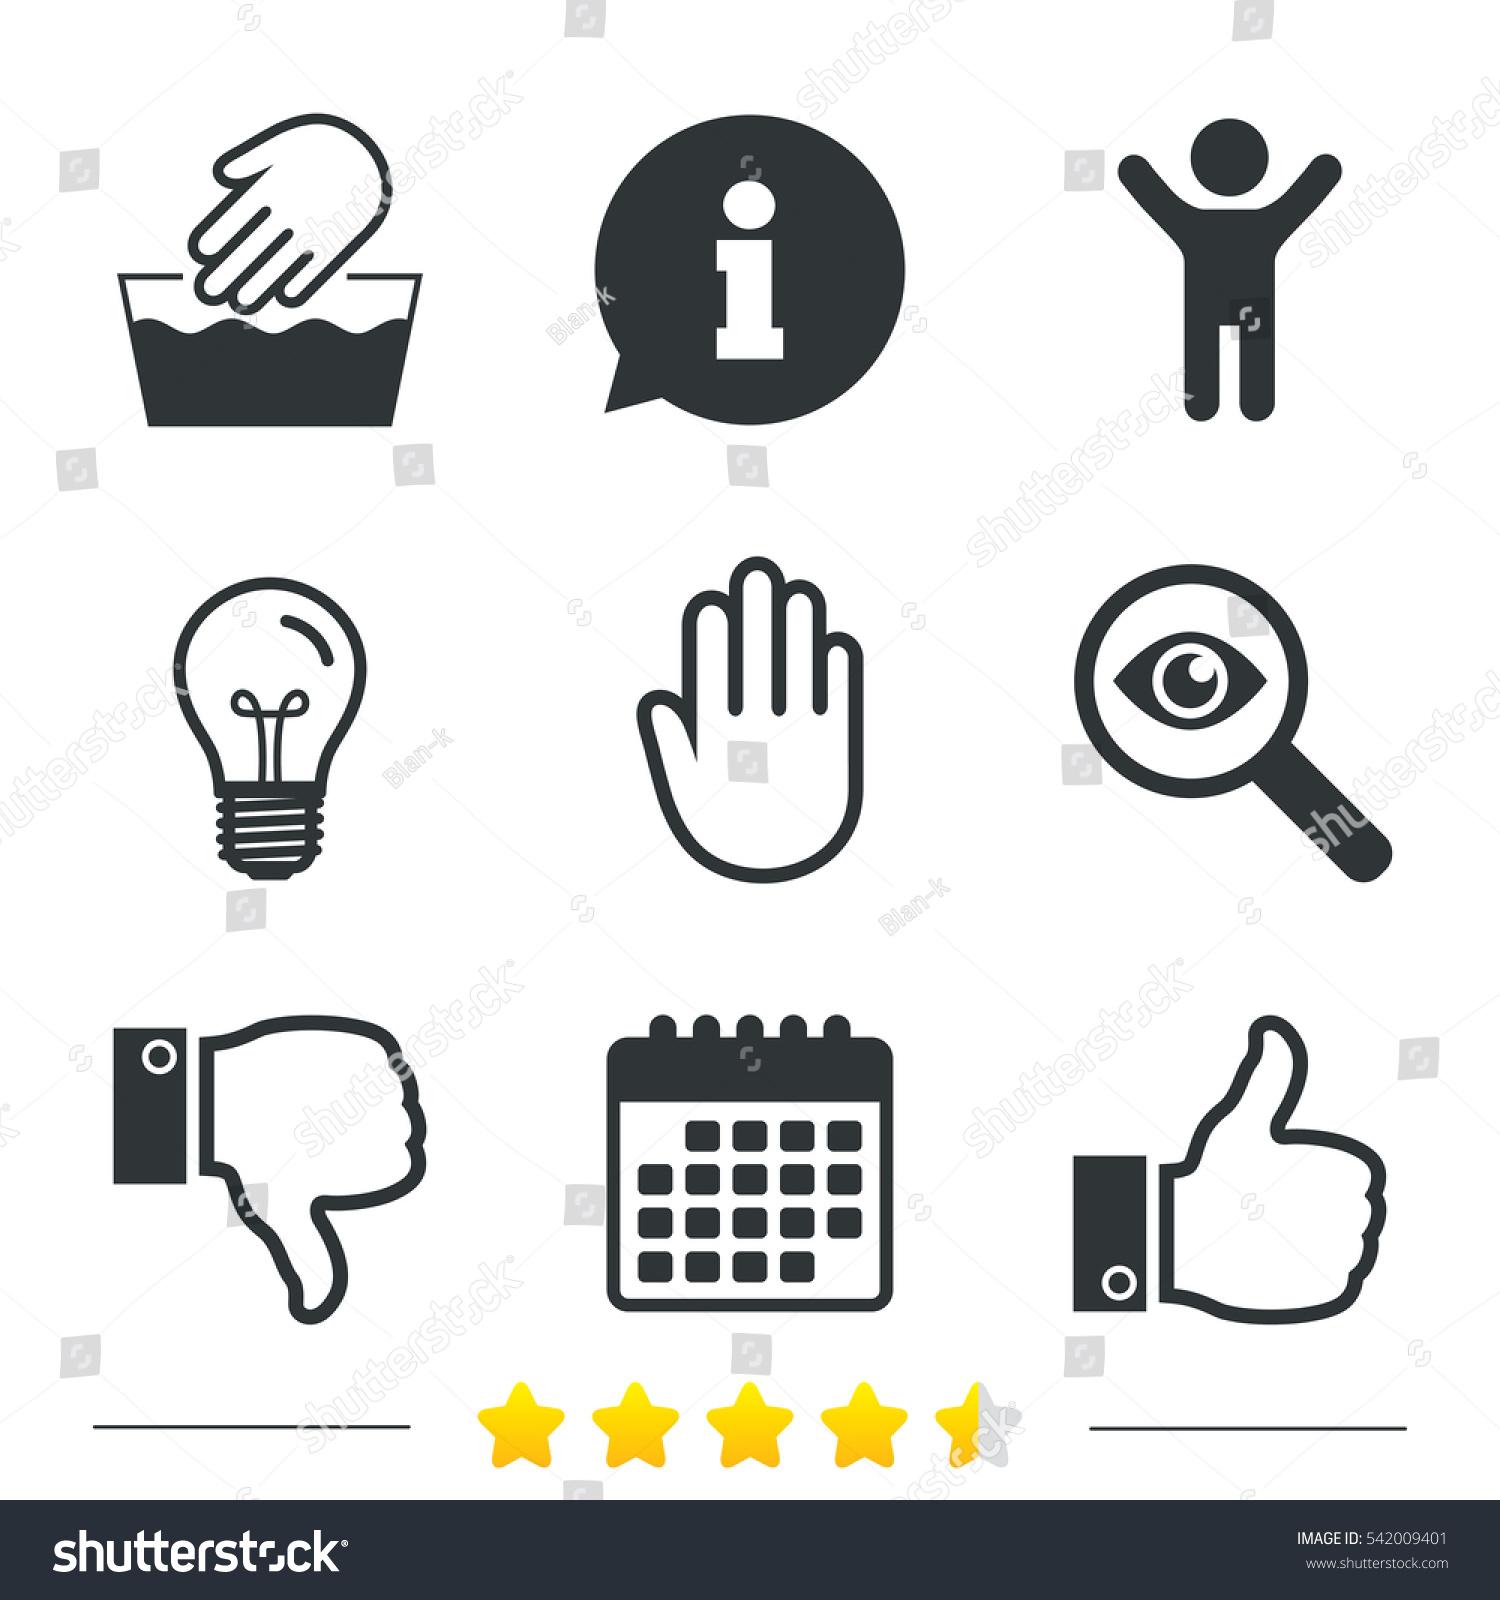 Hand icons like dislike thumb symbols stock illustration 542009401 hand icons like dislike thumb symbols stock illustration 542009401 shutterstock buycottarizona